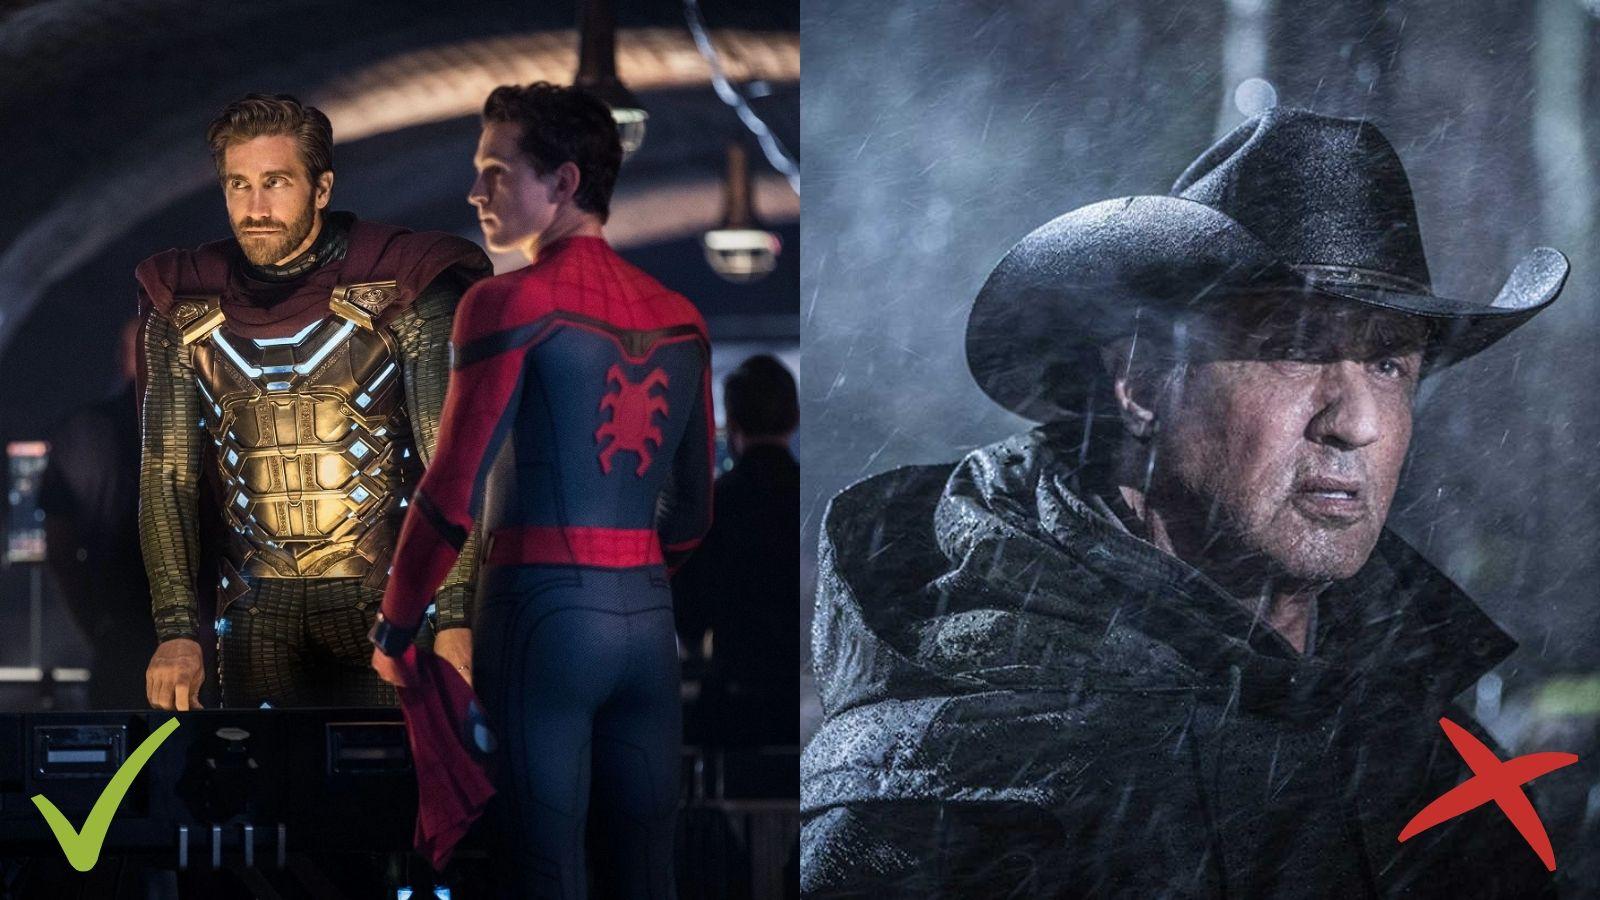 Spider-Man: Far From Home, Rambo: Last Blood, Zirnekļcilvēks: Tālu no mājām, Rembo: Pēdējās asinis